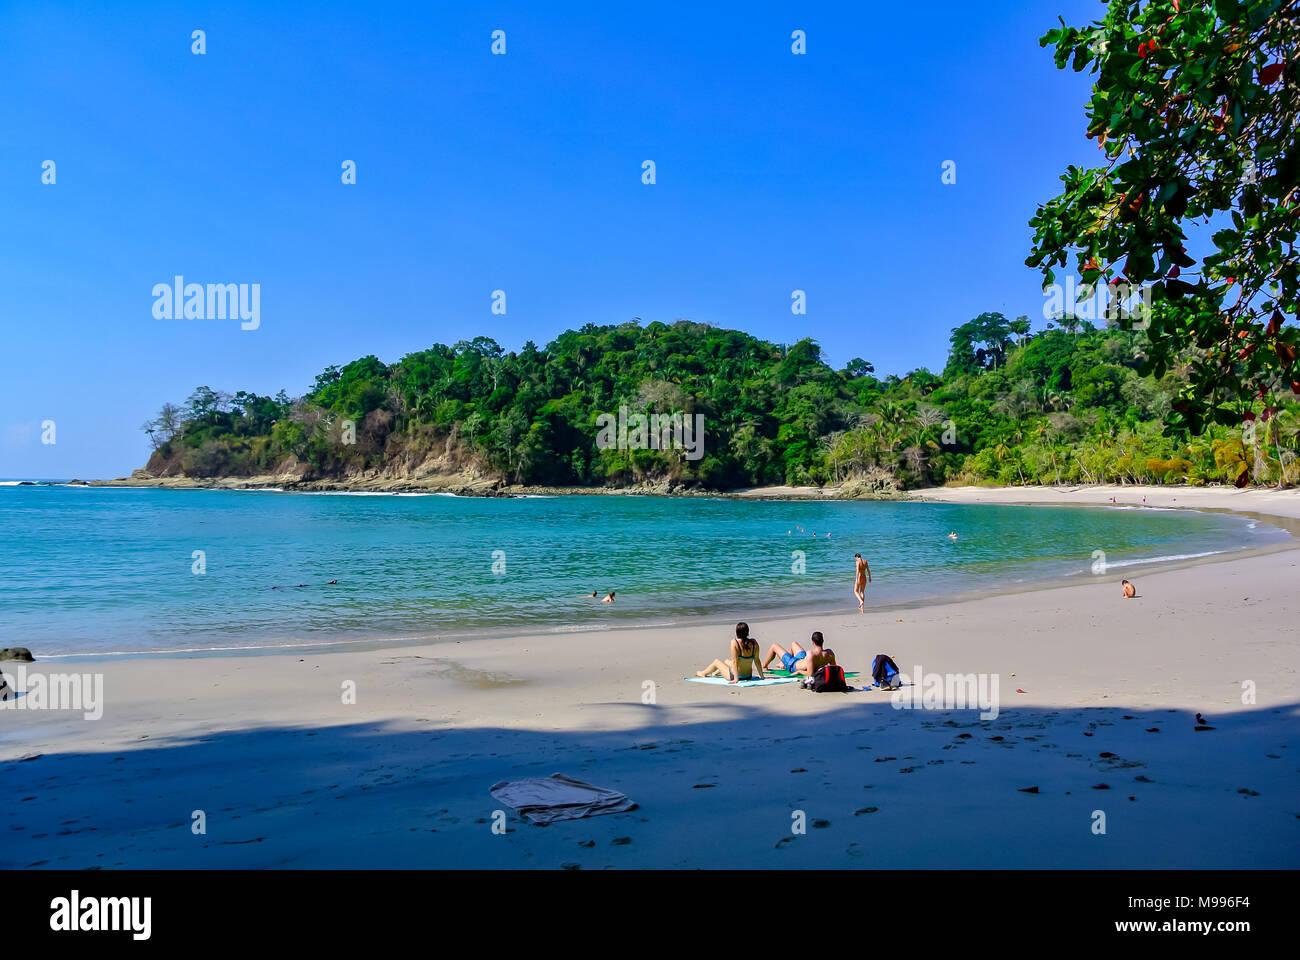 people on beach, Manuel Antonio National Park, Costa Rica, Central America Stock Photo